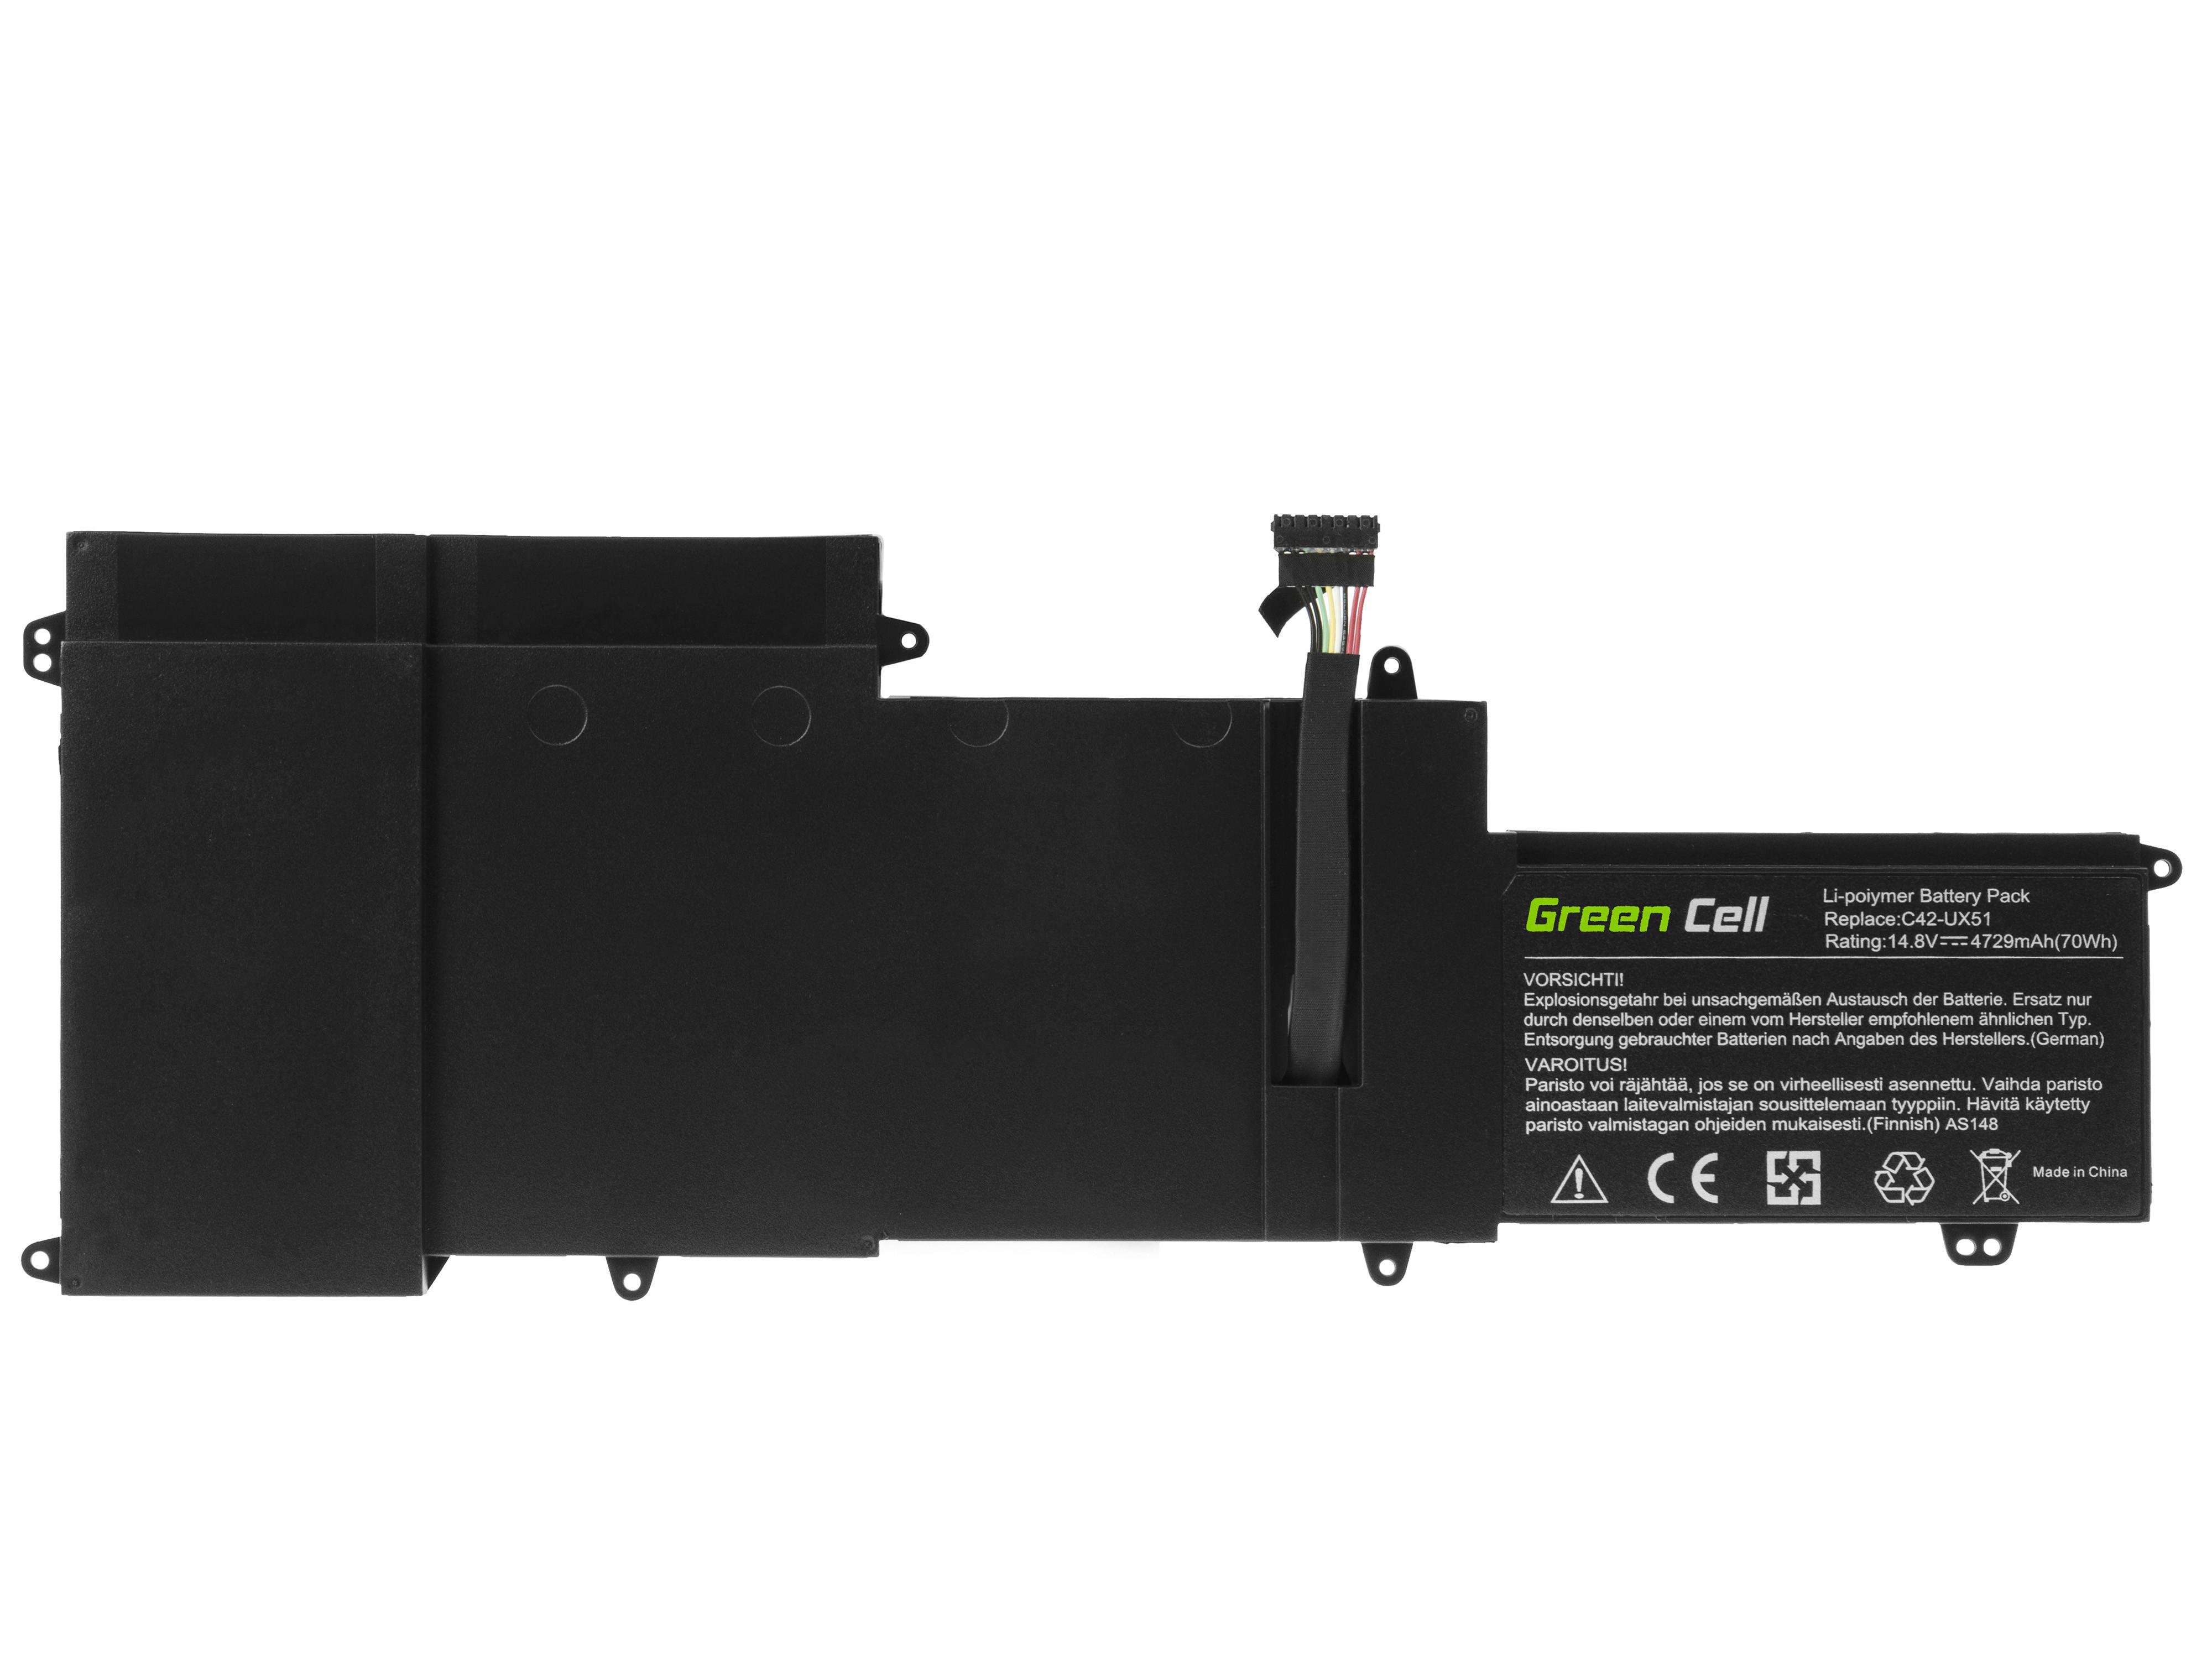 Green Cell AS148 Baterie Asus C42-UX51,Asus ZenBook UX51 UX51V UX51VZ 4729mAh Li-Pol – neoriginální